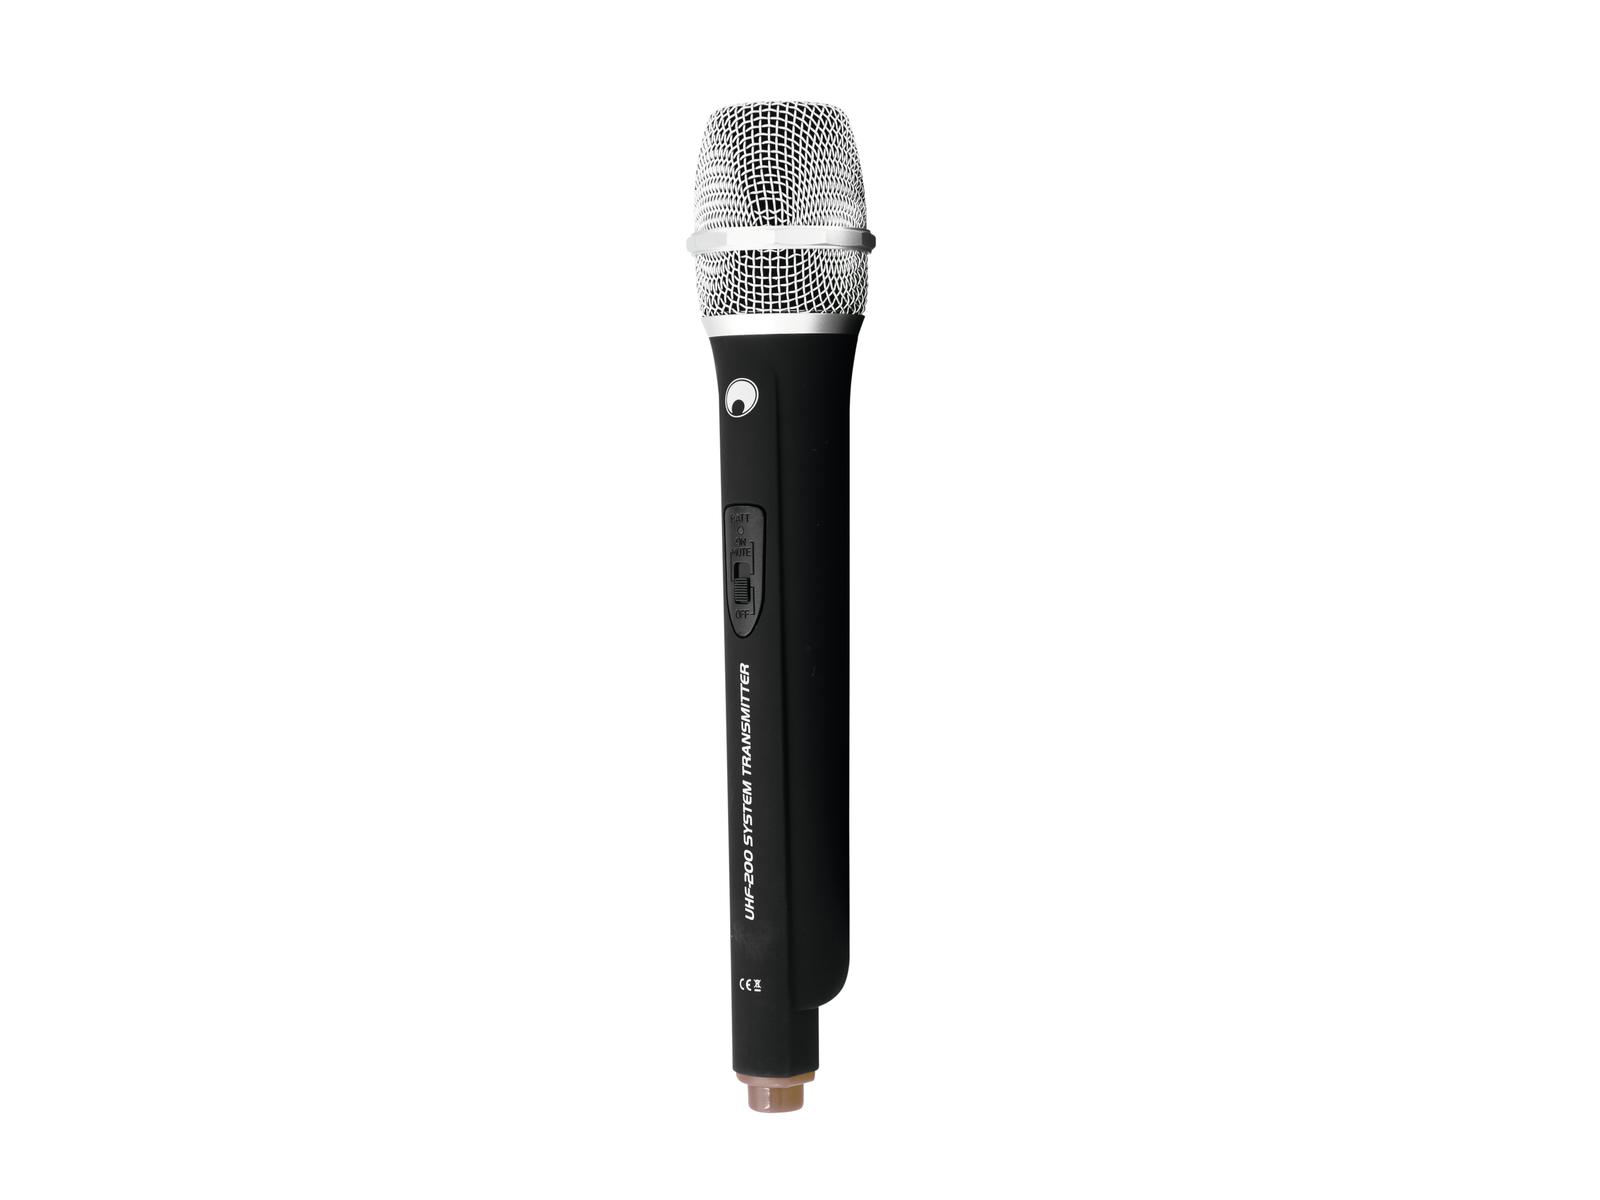 OMNITRONIC Microfono UHF-200 (824.925 MHz) (marrone)